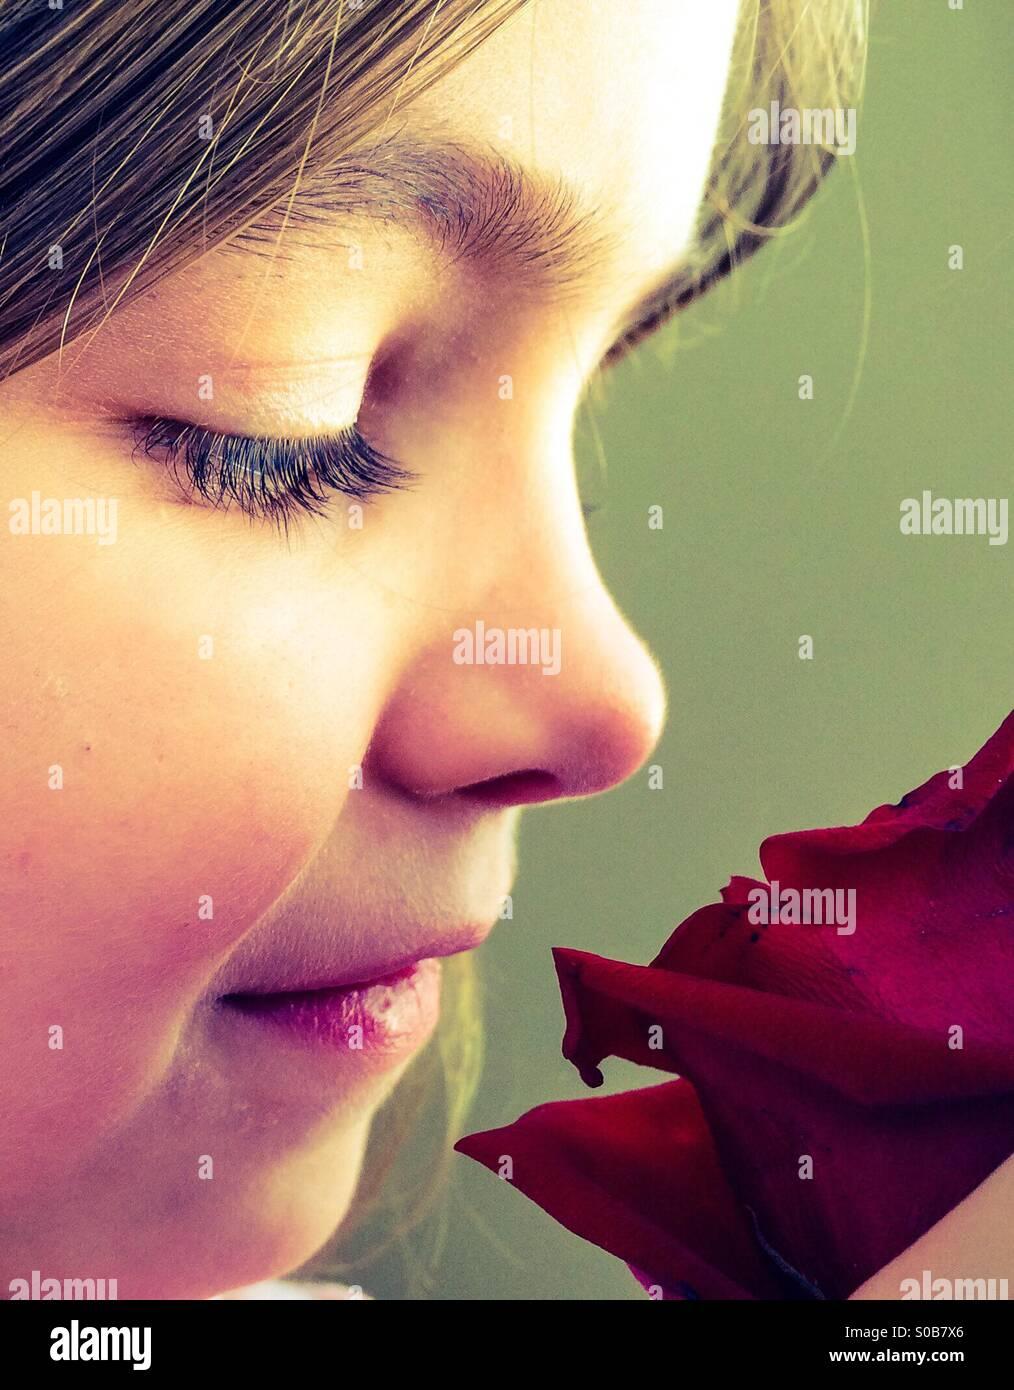 Jeune fille et une Rose Photo Stock